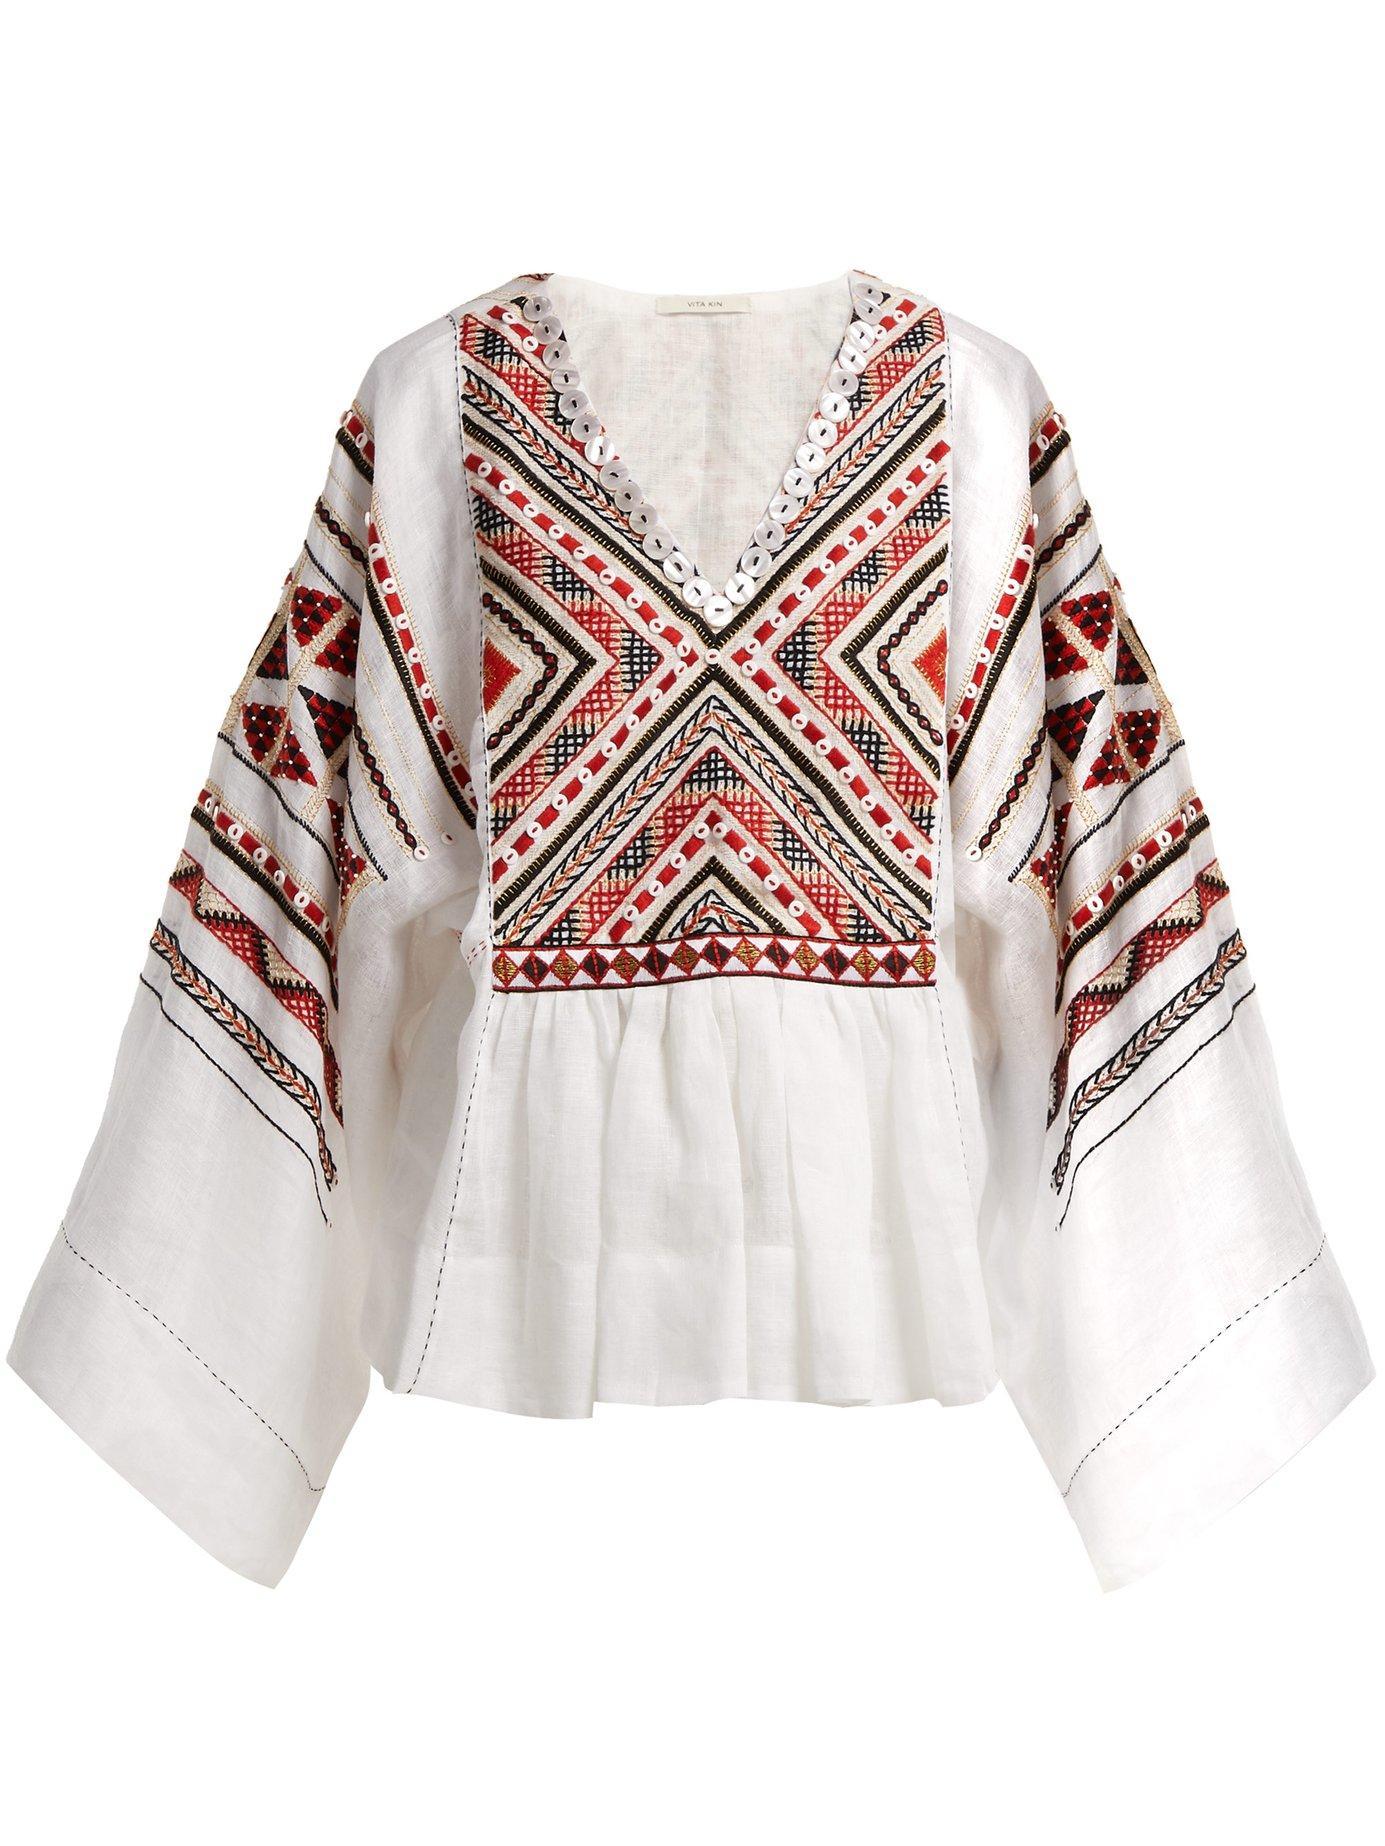 a5b74902 Vita Kin - Malta Embroidered Linen Top - Womens - White Multi | ModeSens